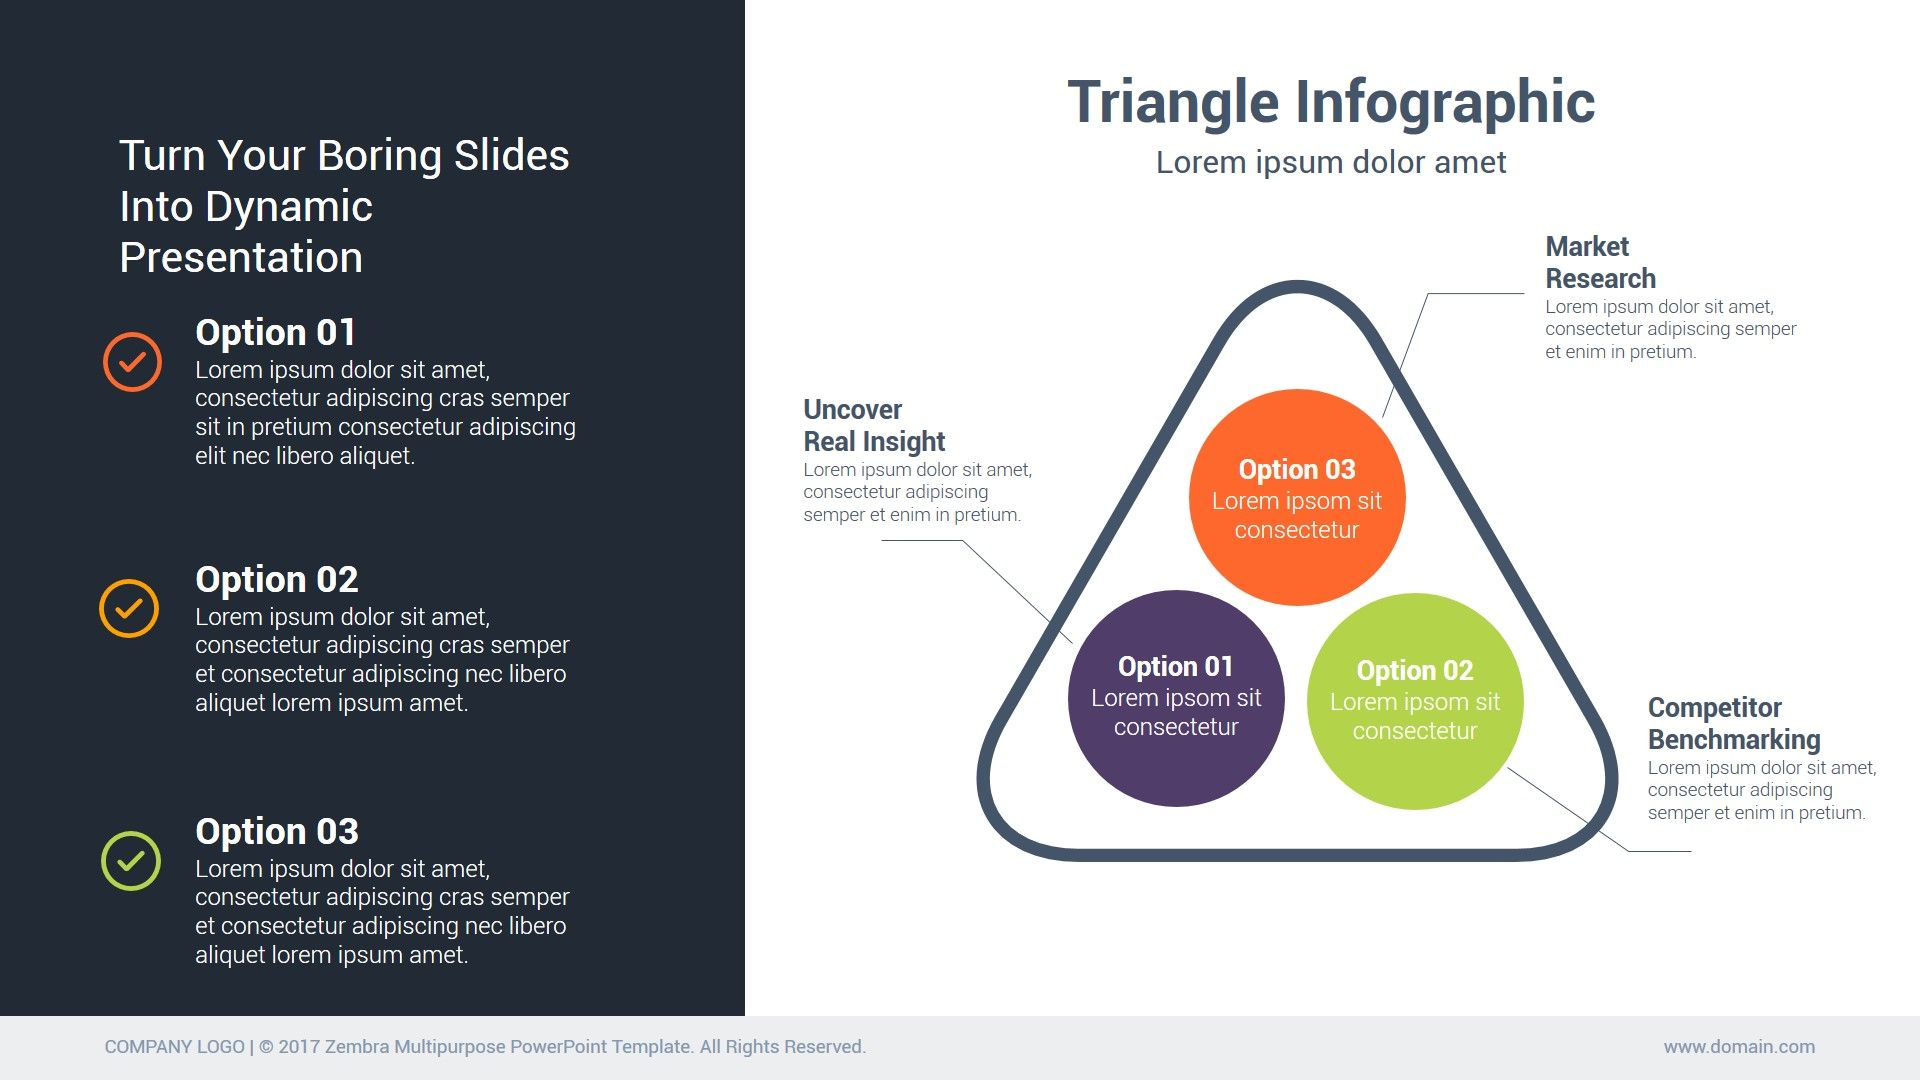 Zembra MultiPurpose PowerPoint Template Ad MultiPurpose